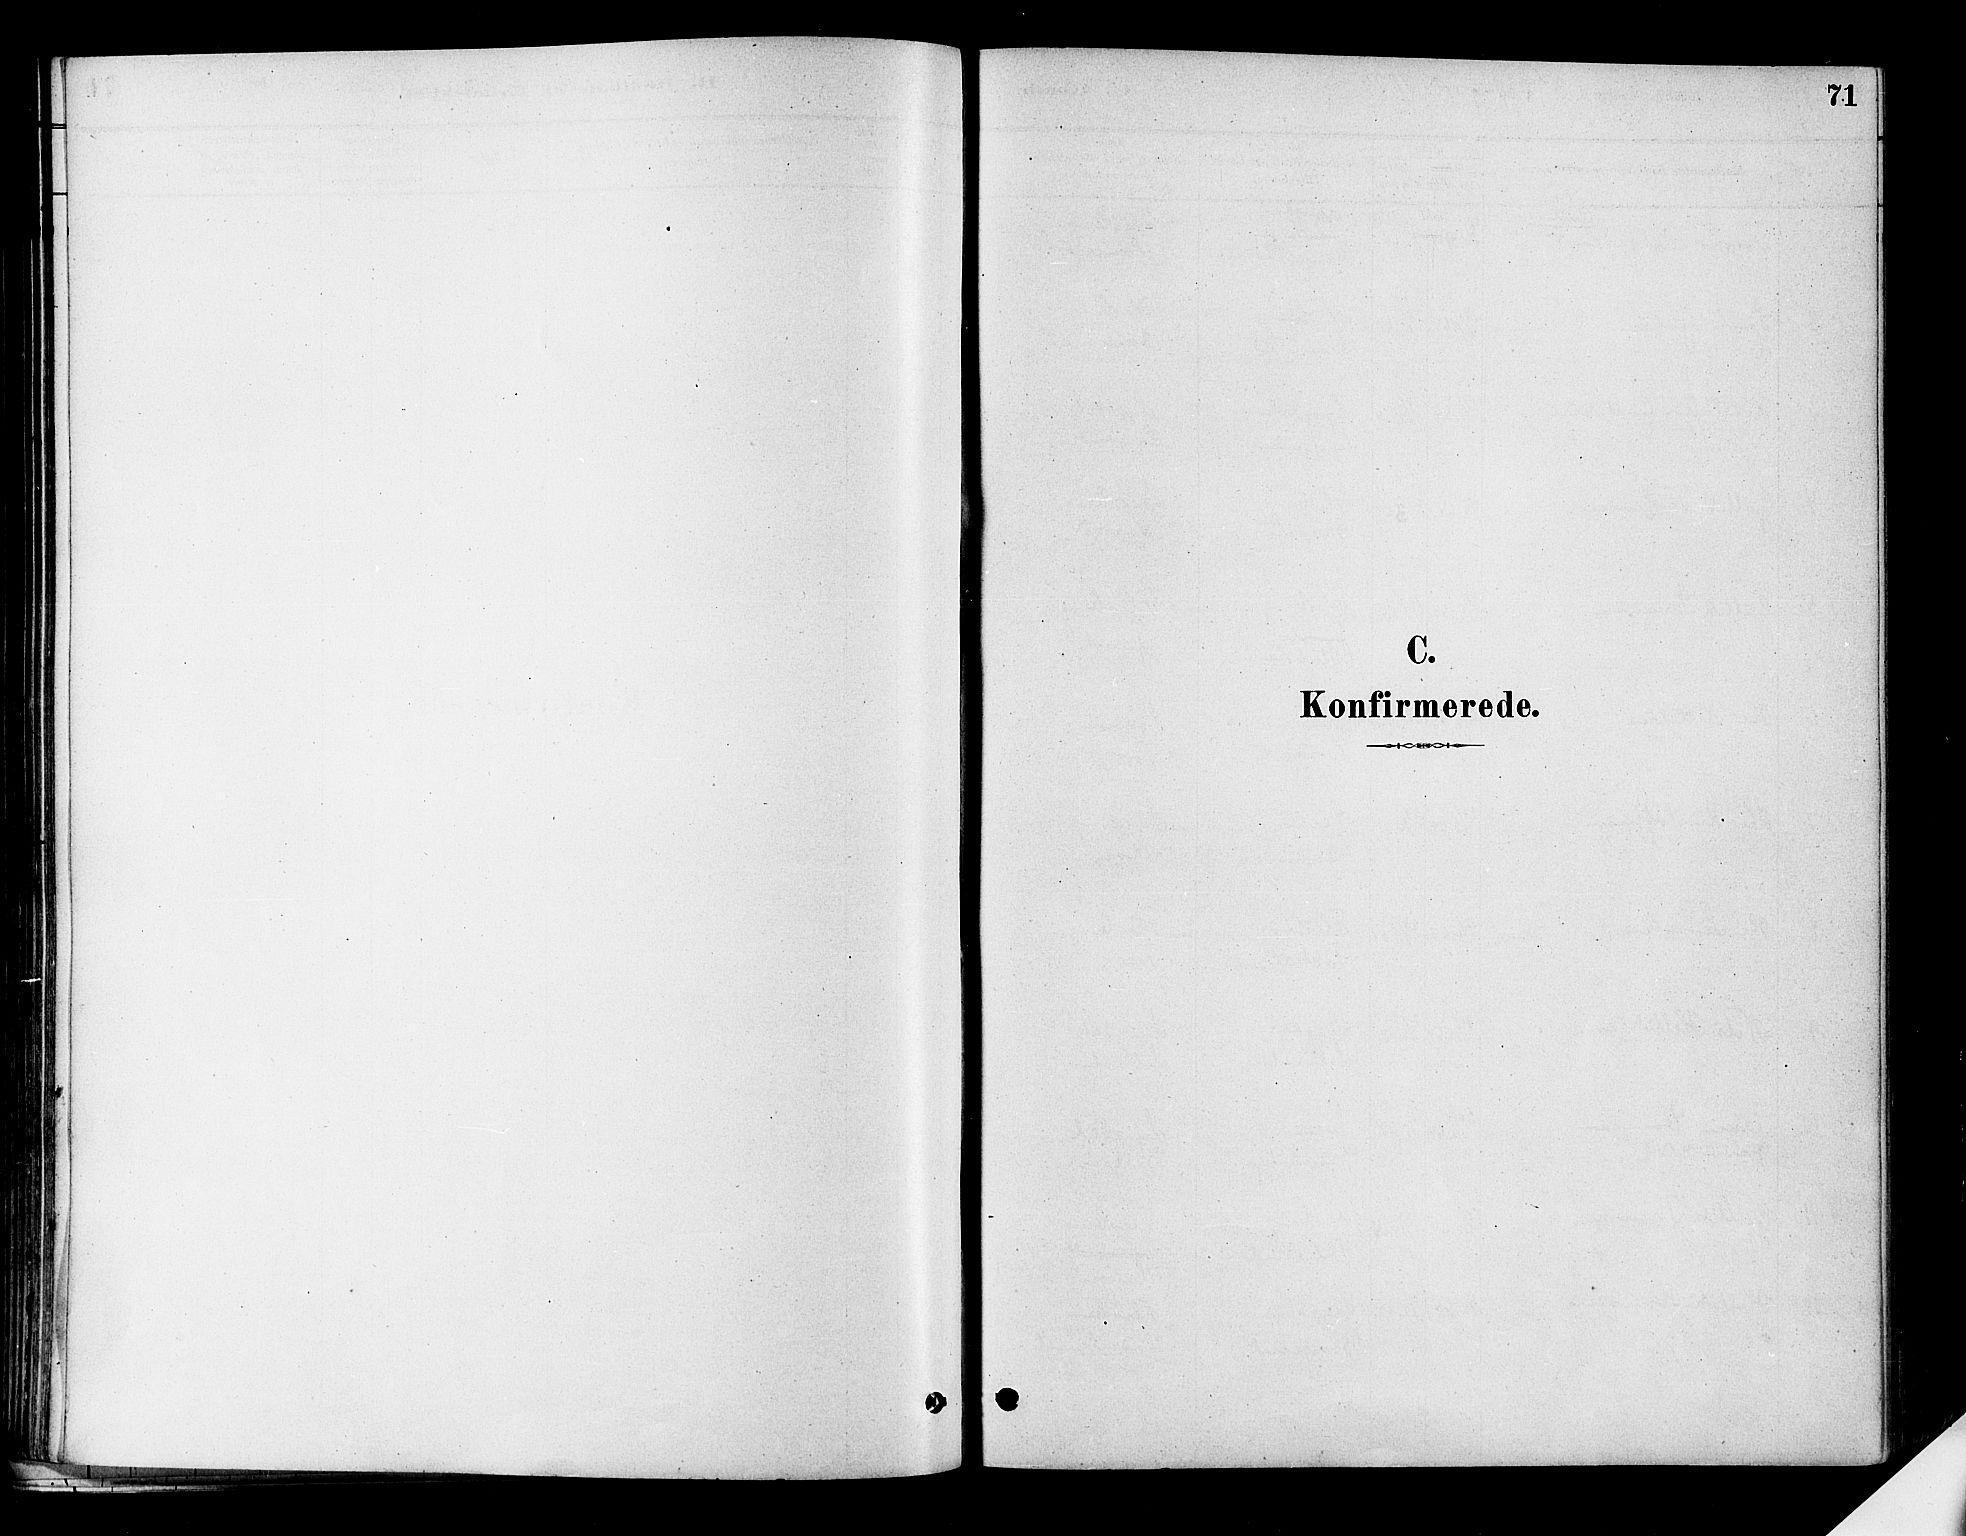 SAKO, Flesberg kirkebøker, F/Fa/L0008: Ministerialbok nr. I 8, 1879-1899, s. 71